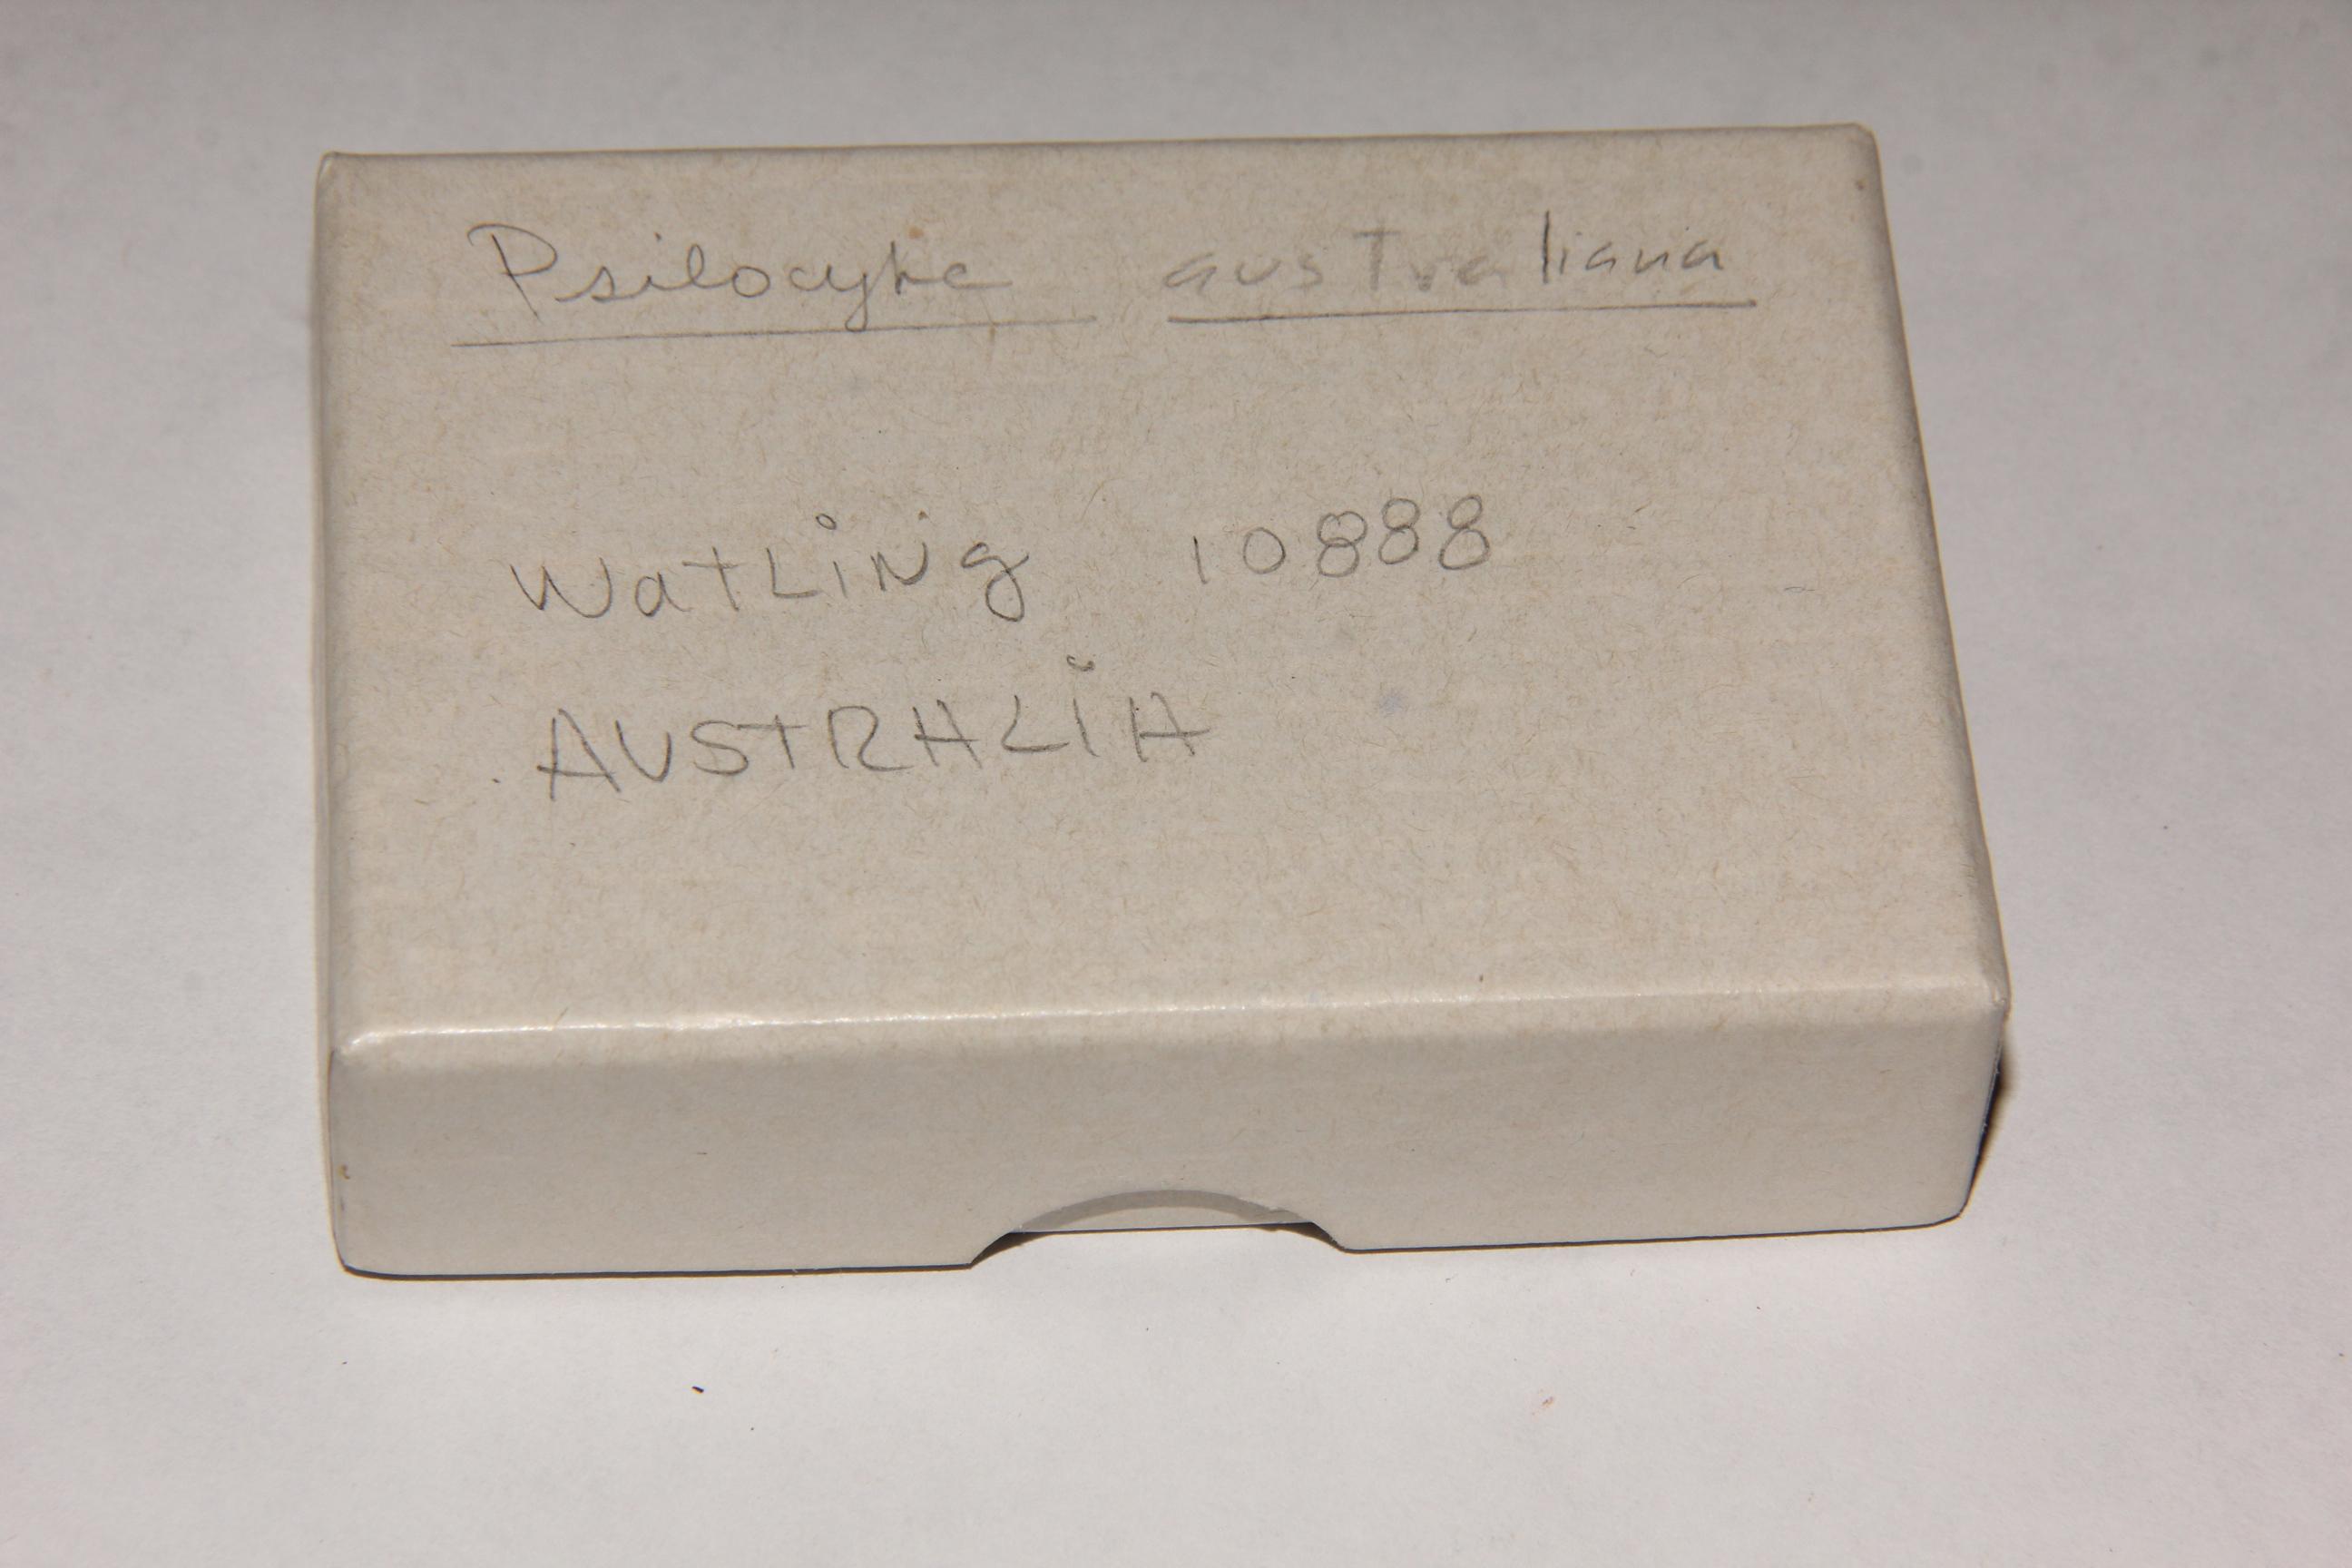 Psilocybe australiana image